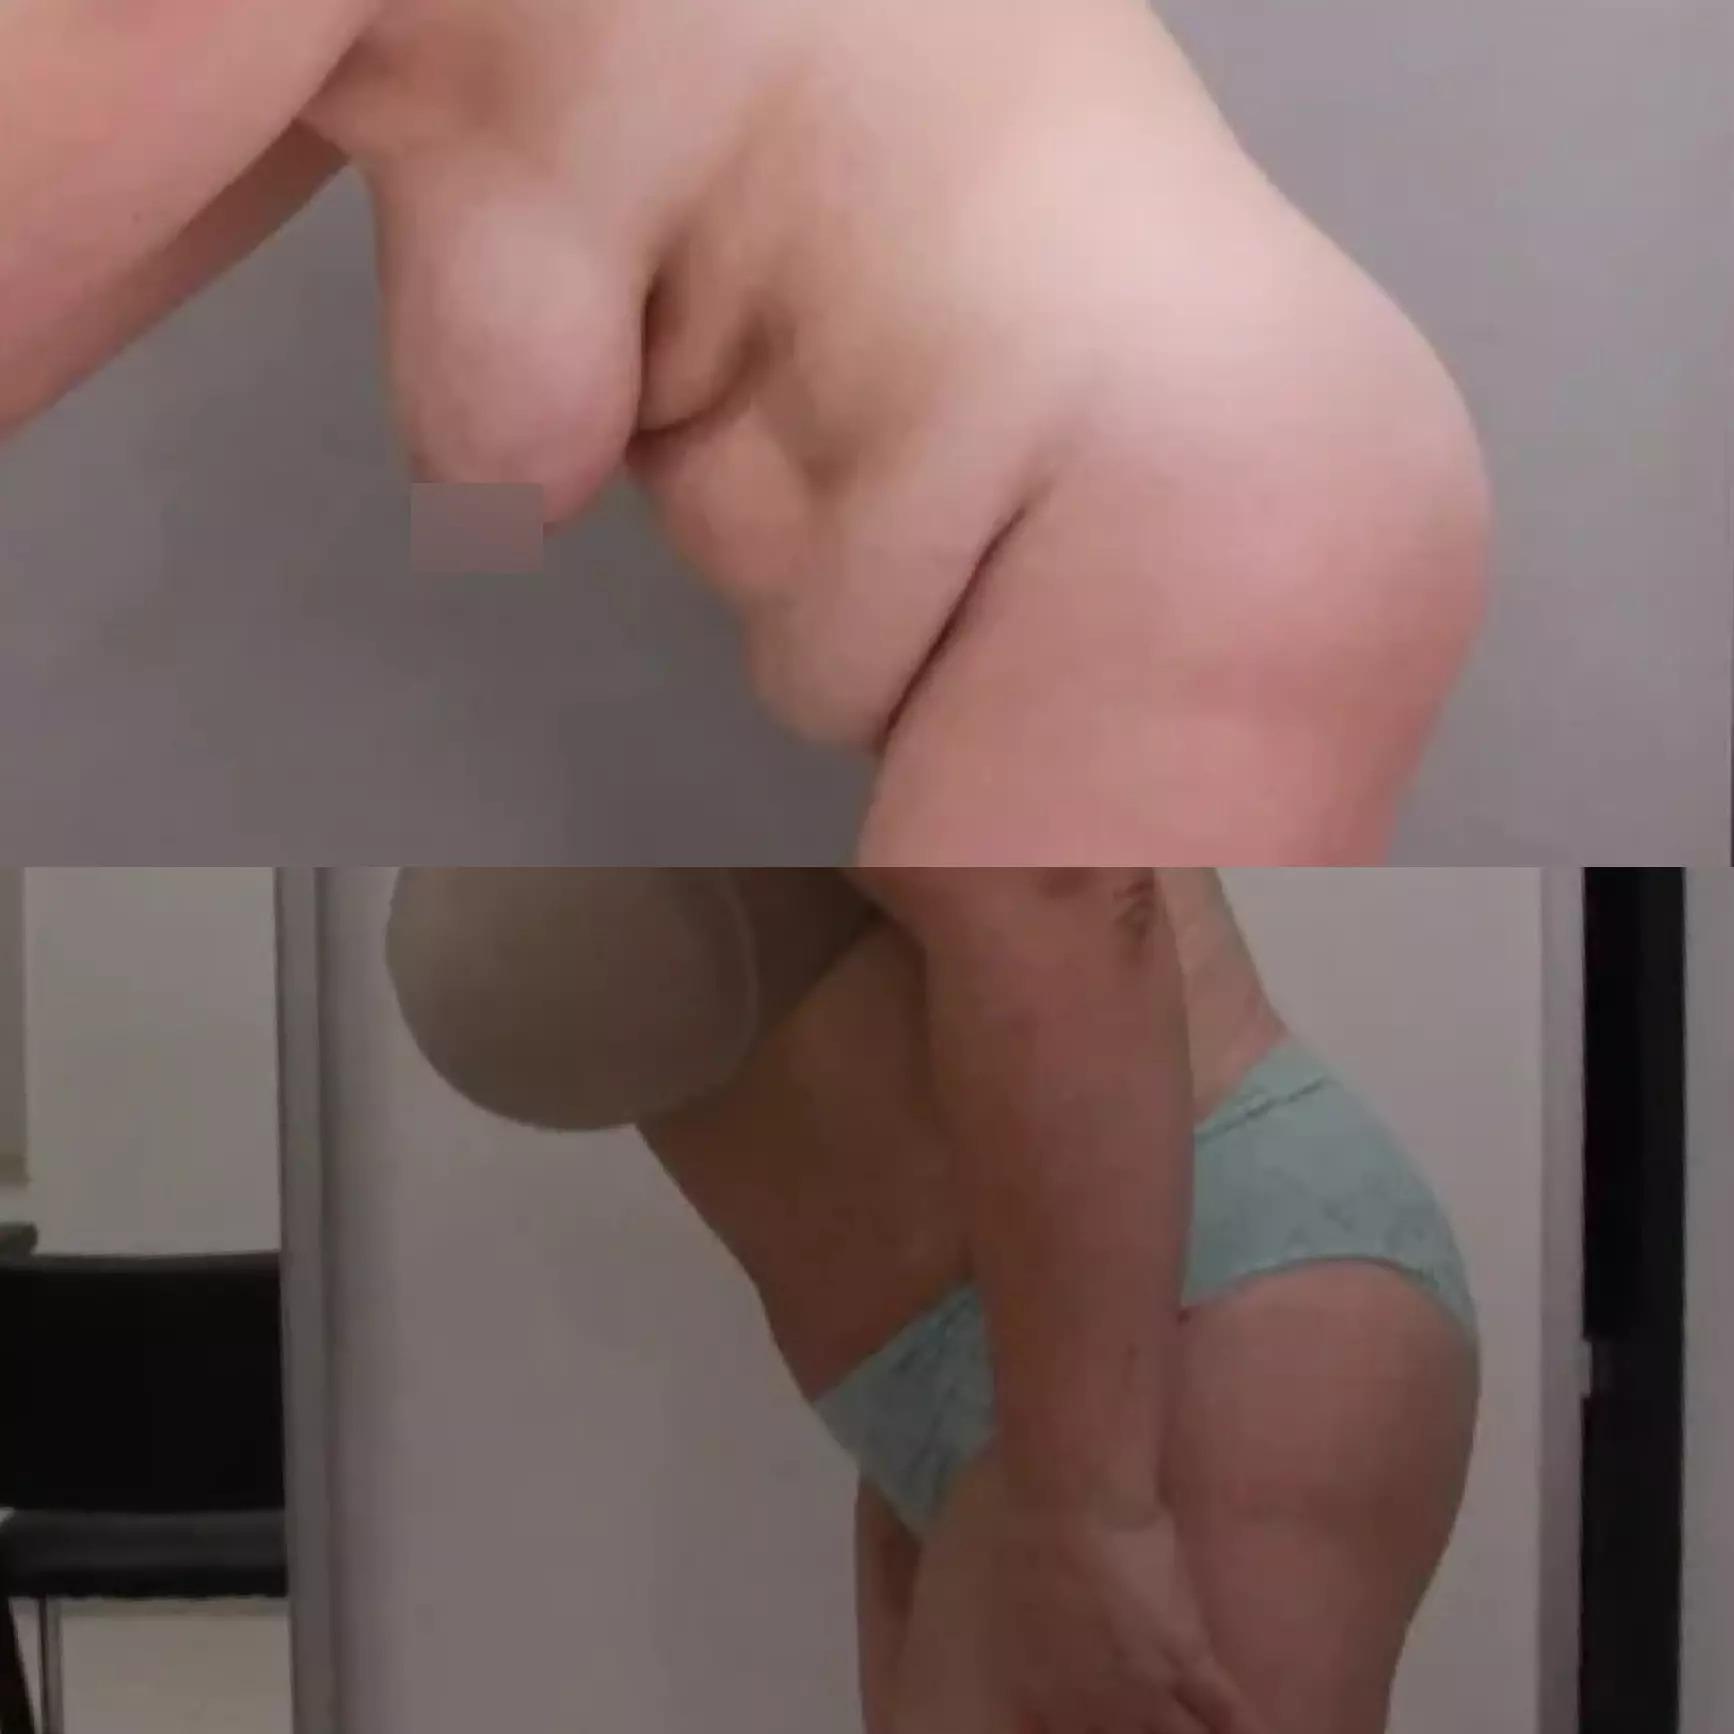 Абдоминопластика, липосакция живота, колен, лобка, поясницы, внутр. поверхности бедер, спустя 1 месяц